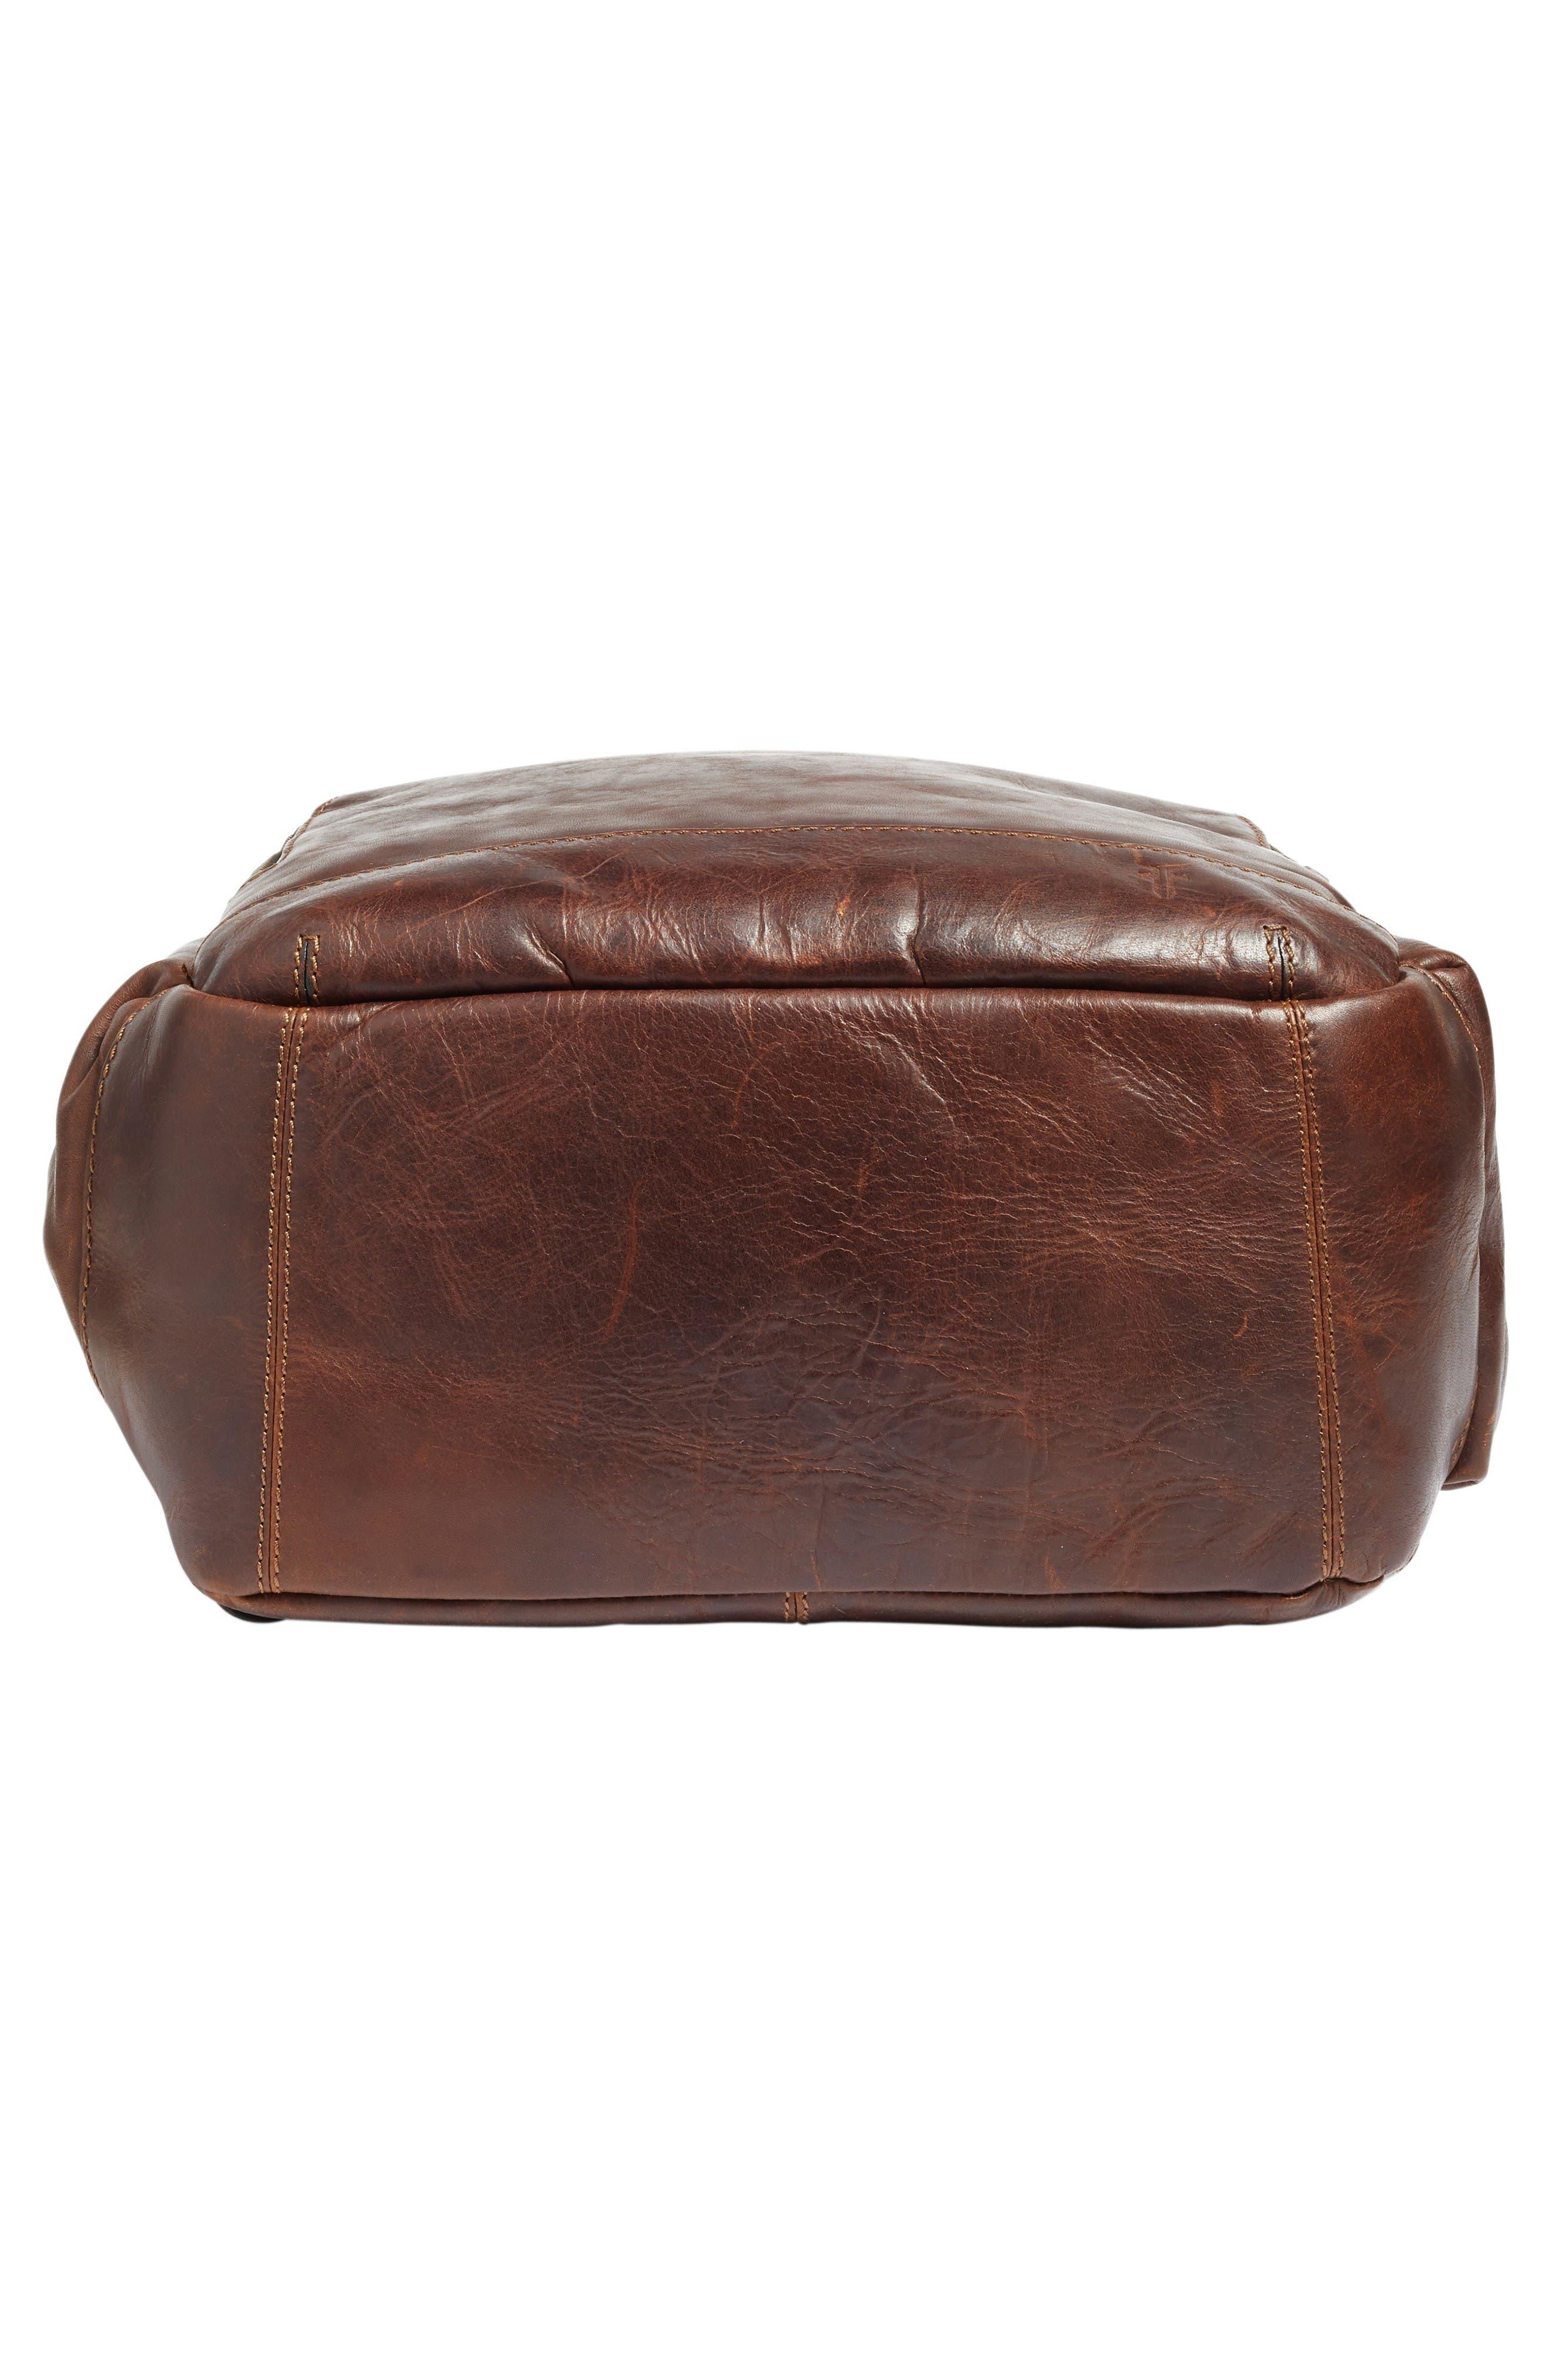 'Logan' Leather Backpack,                             Alternate thumbnail 6, color,                             Dark Brown